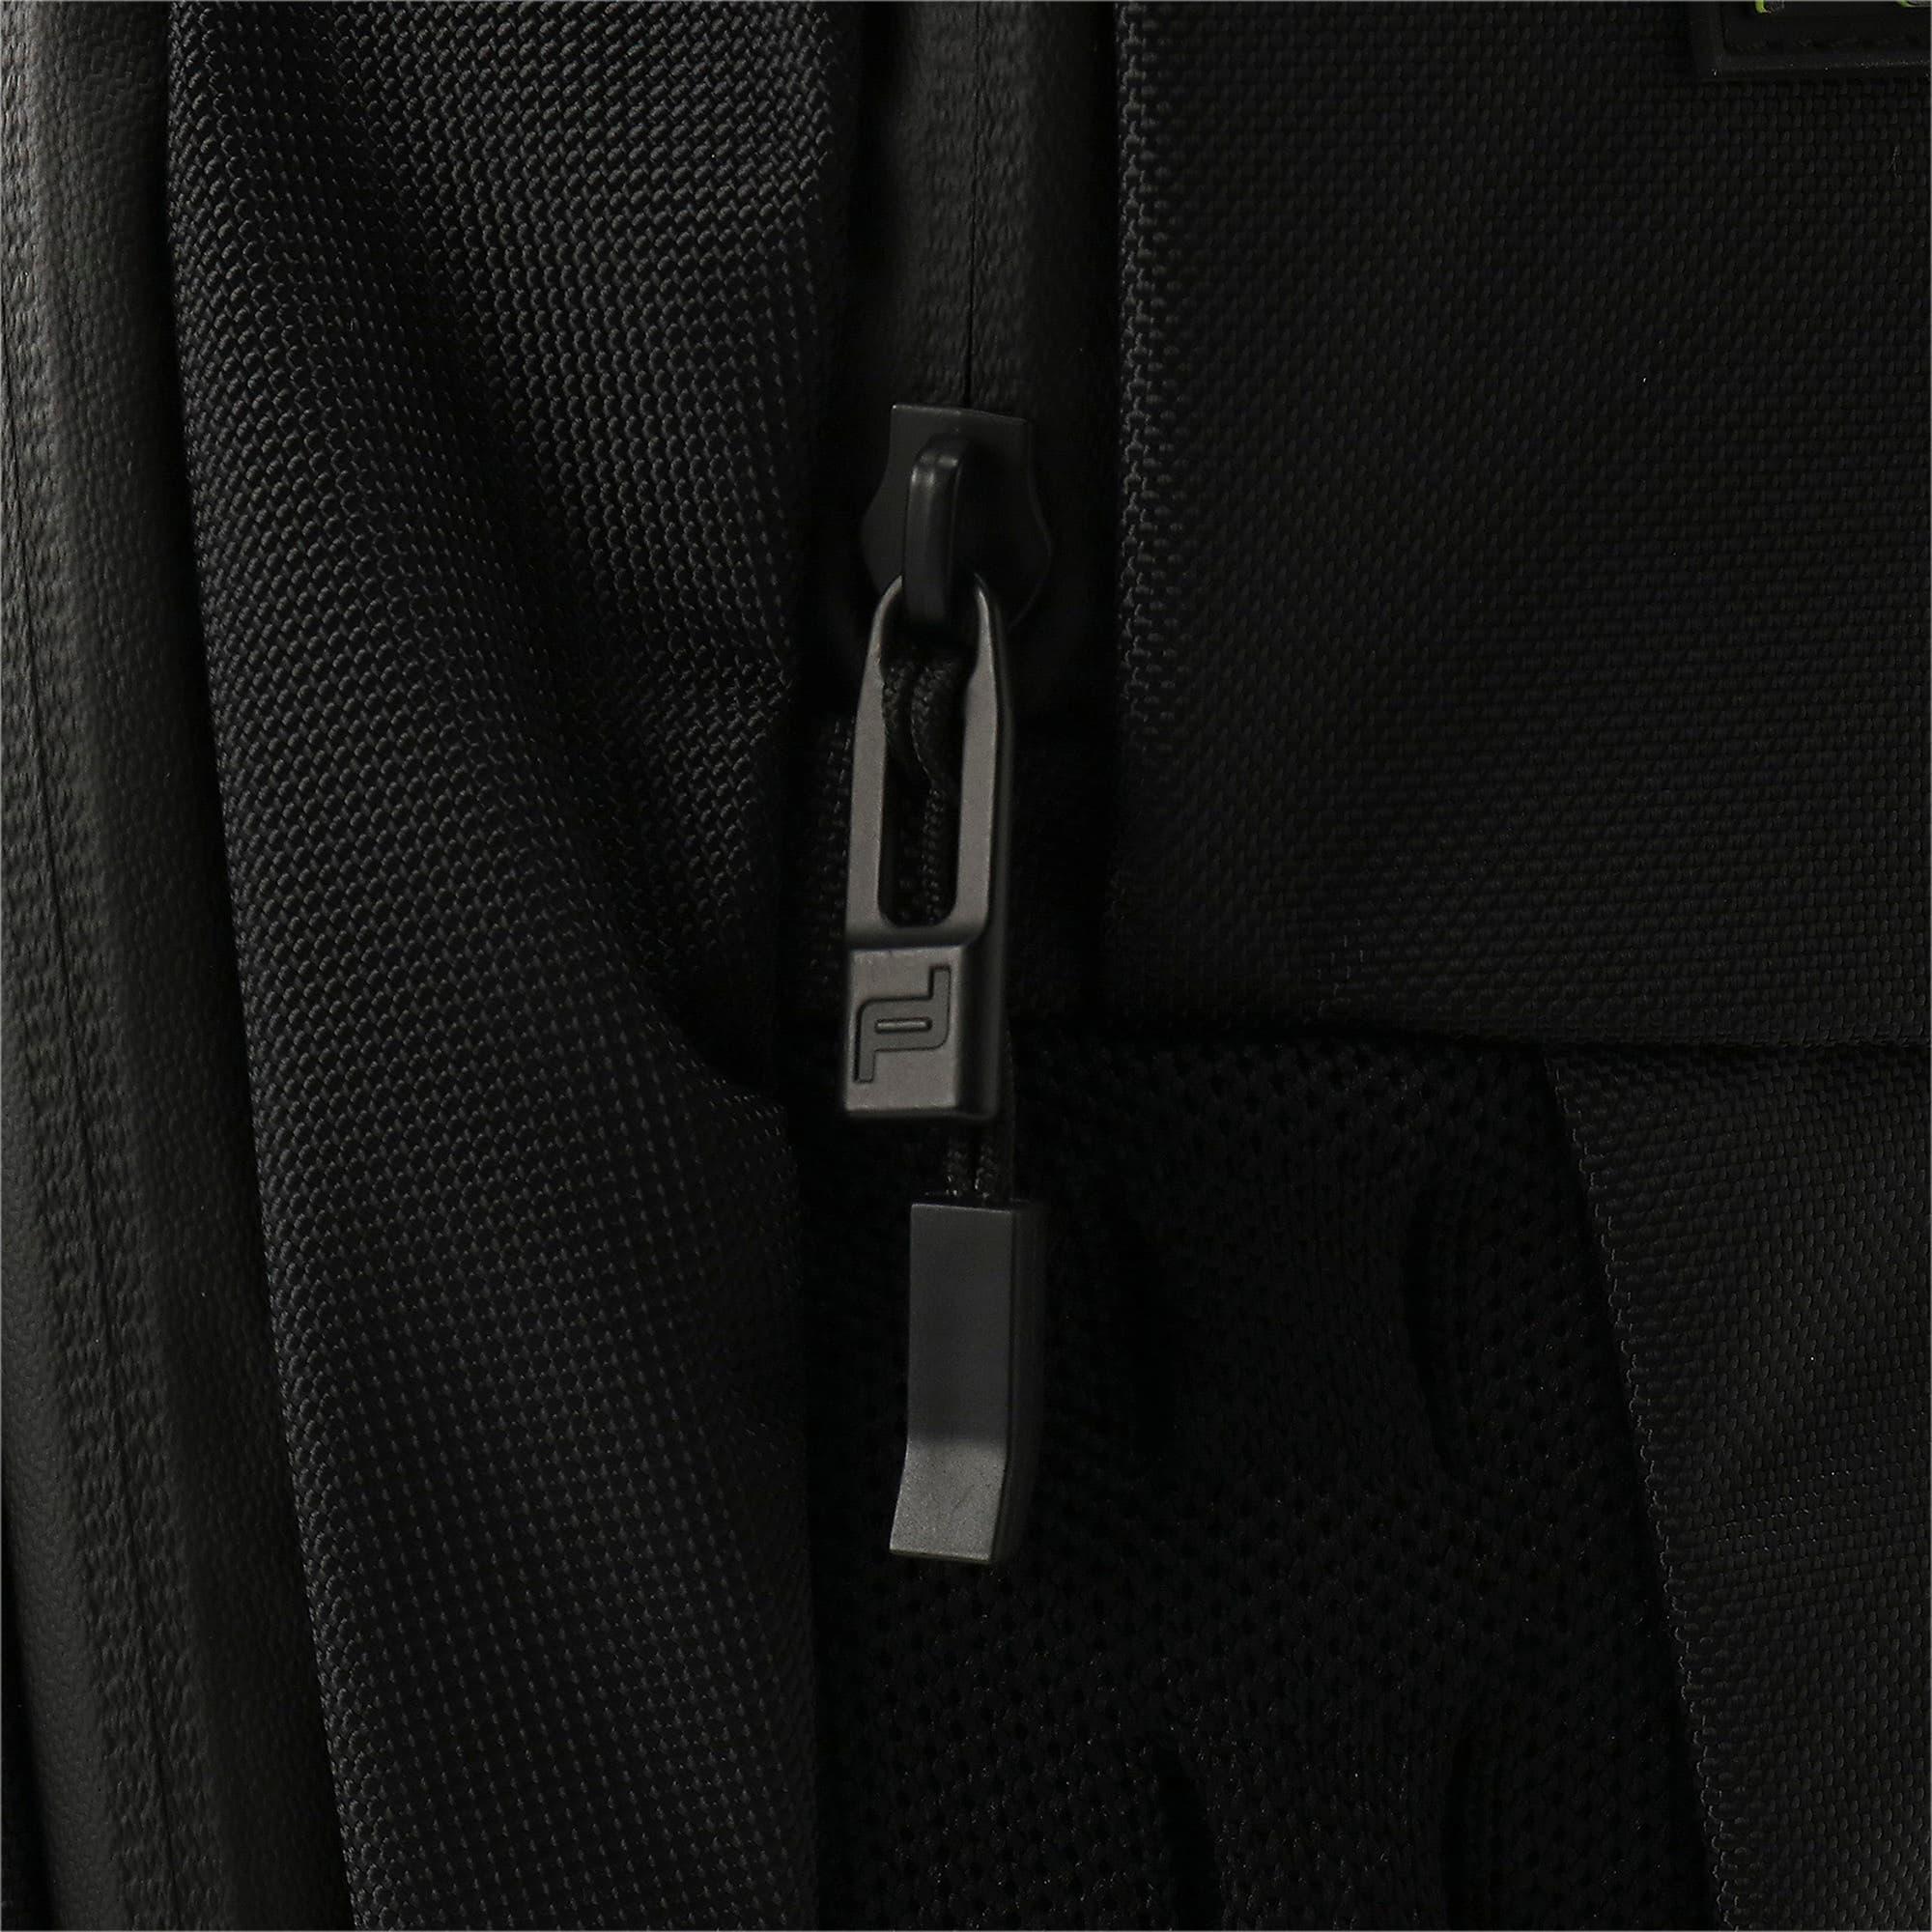 Thumbnail 8 of ポルシェデザイン PD EVOKNIT バックパック 26L, Puma Black, medium-JPN